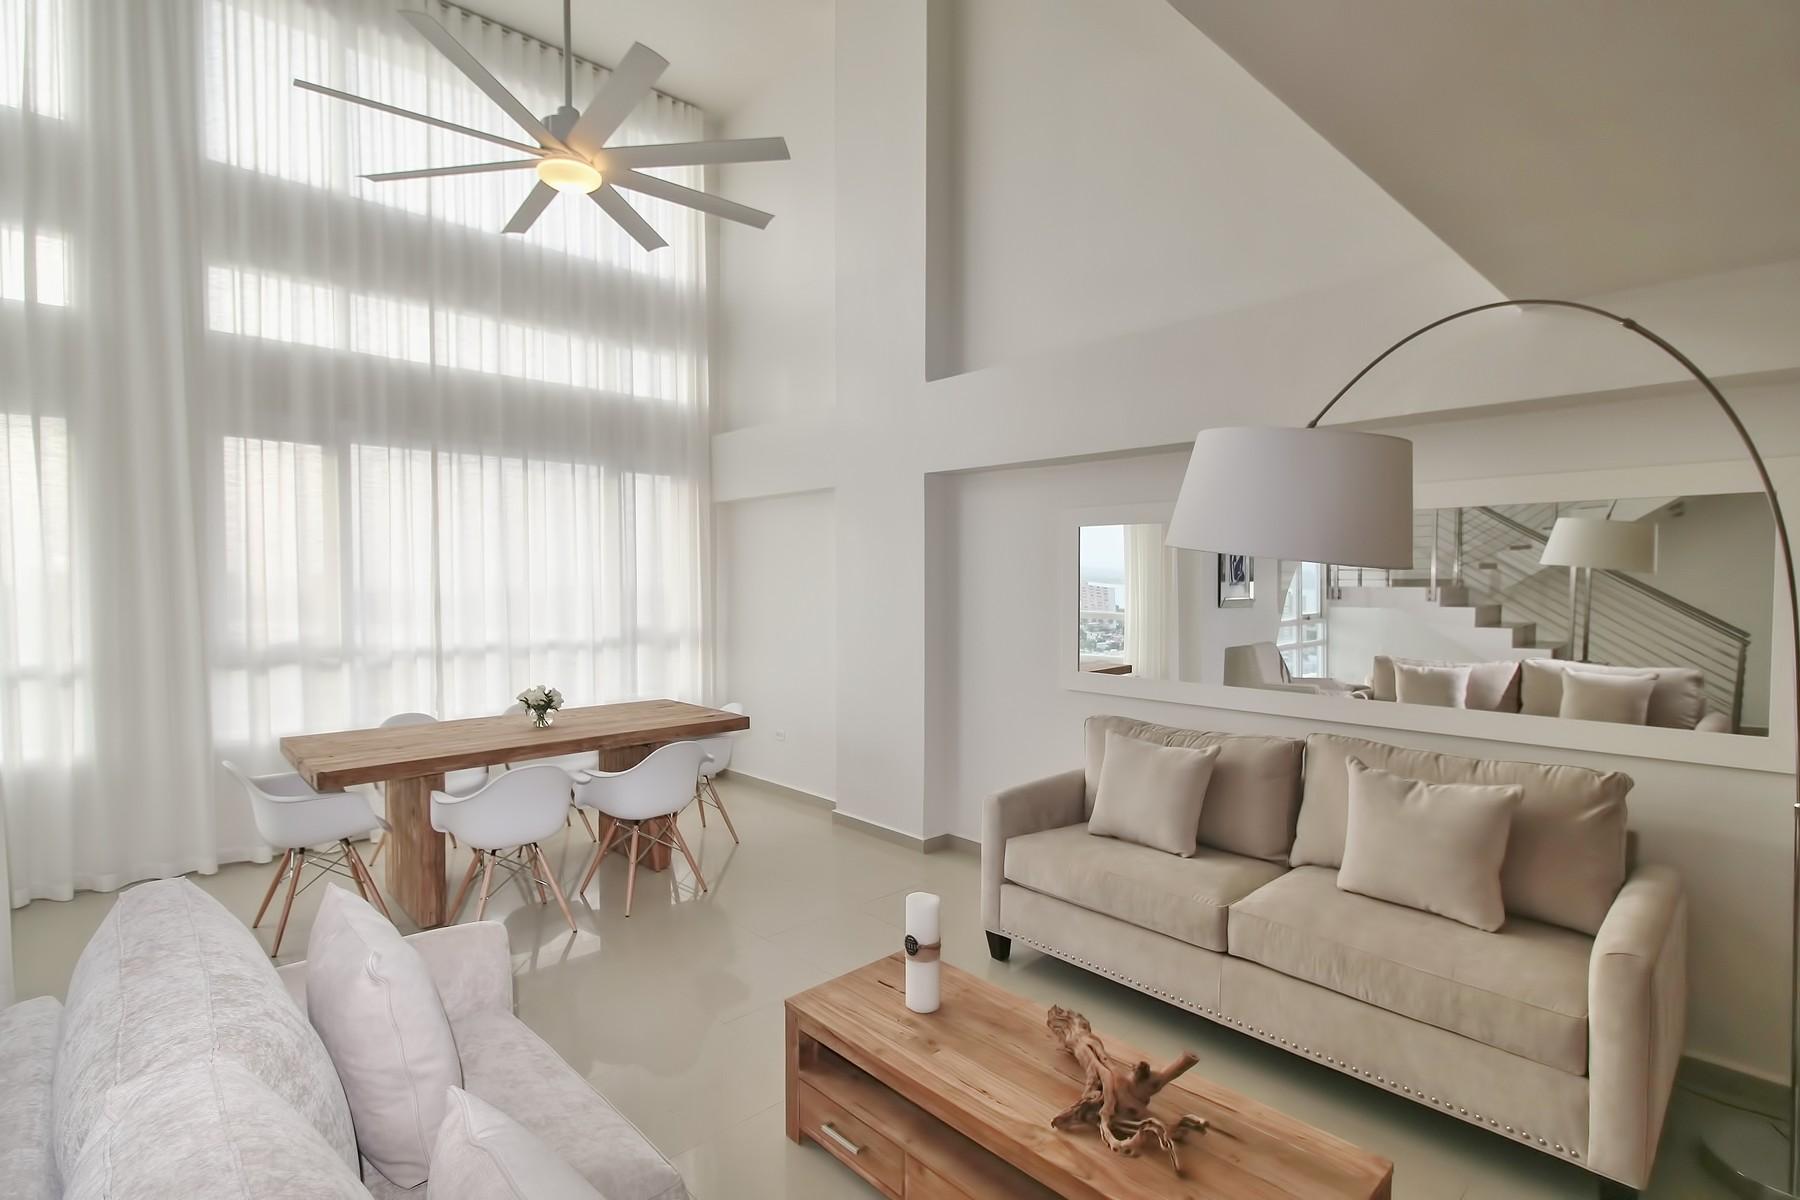 Property For Sale at Northwest Skyline Penthouse at 303 Villamil